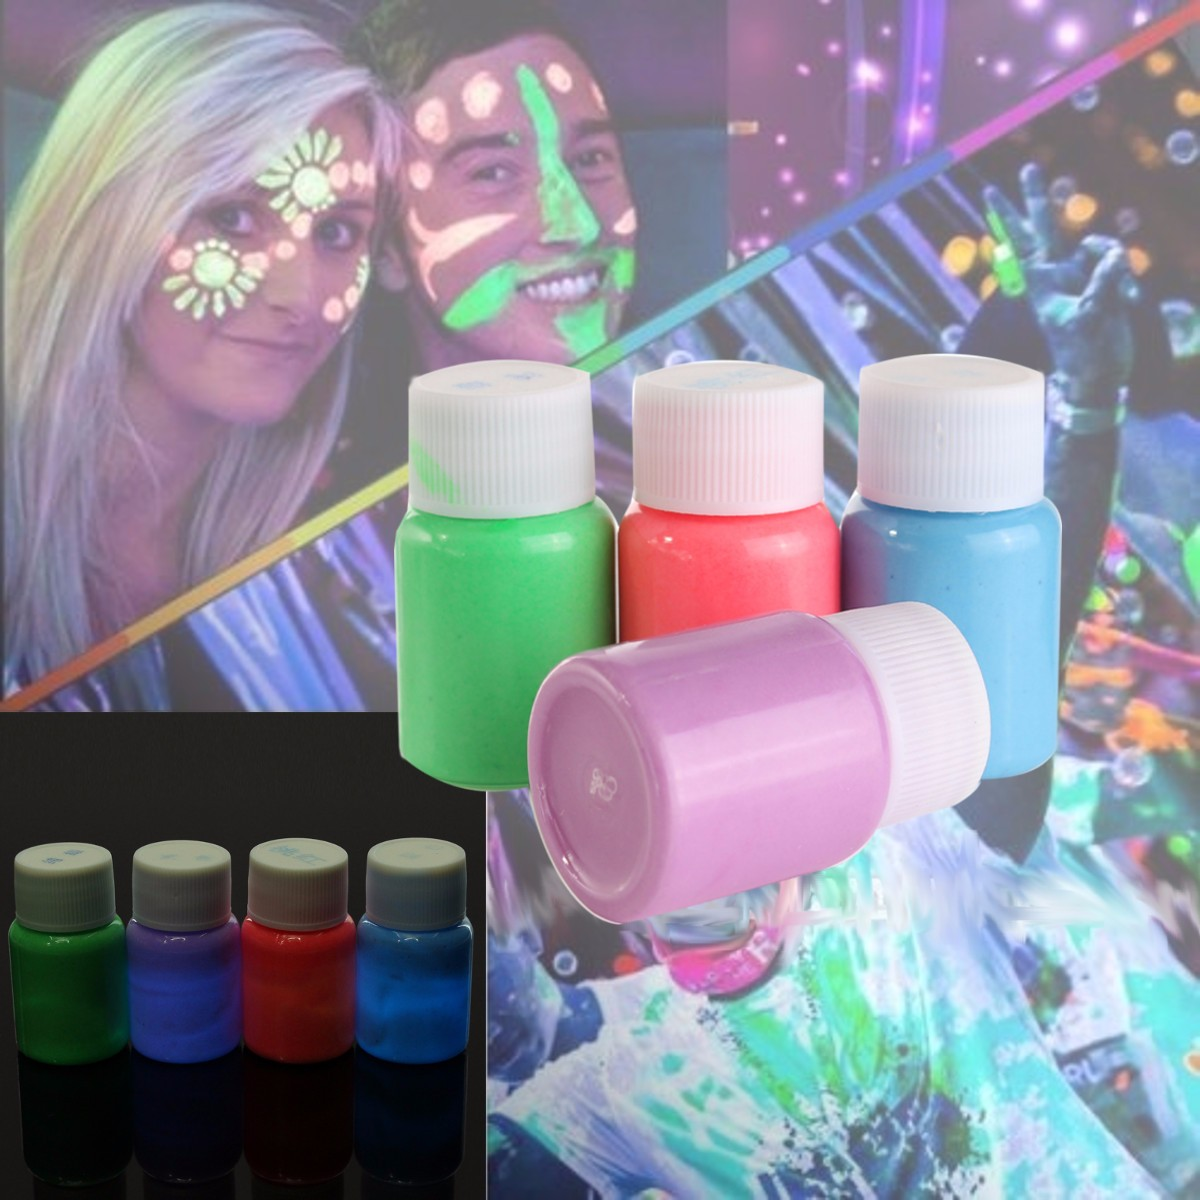 Hot Selling 5Colors Acrylic Paints Face Body Paint Fluorescent Grow In Dark Pigments Makeup Art Painting Luminous Acrylic Paints